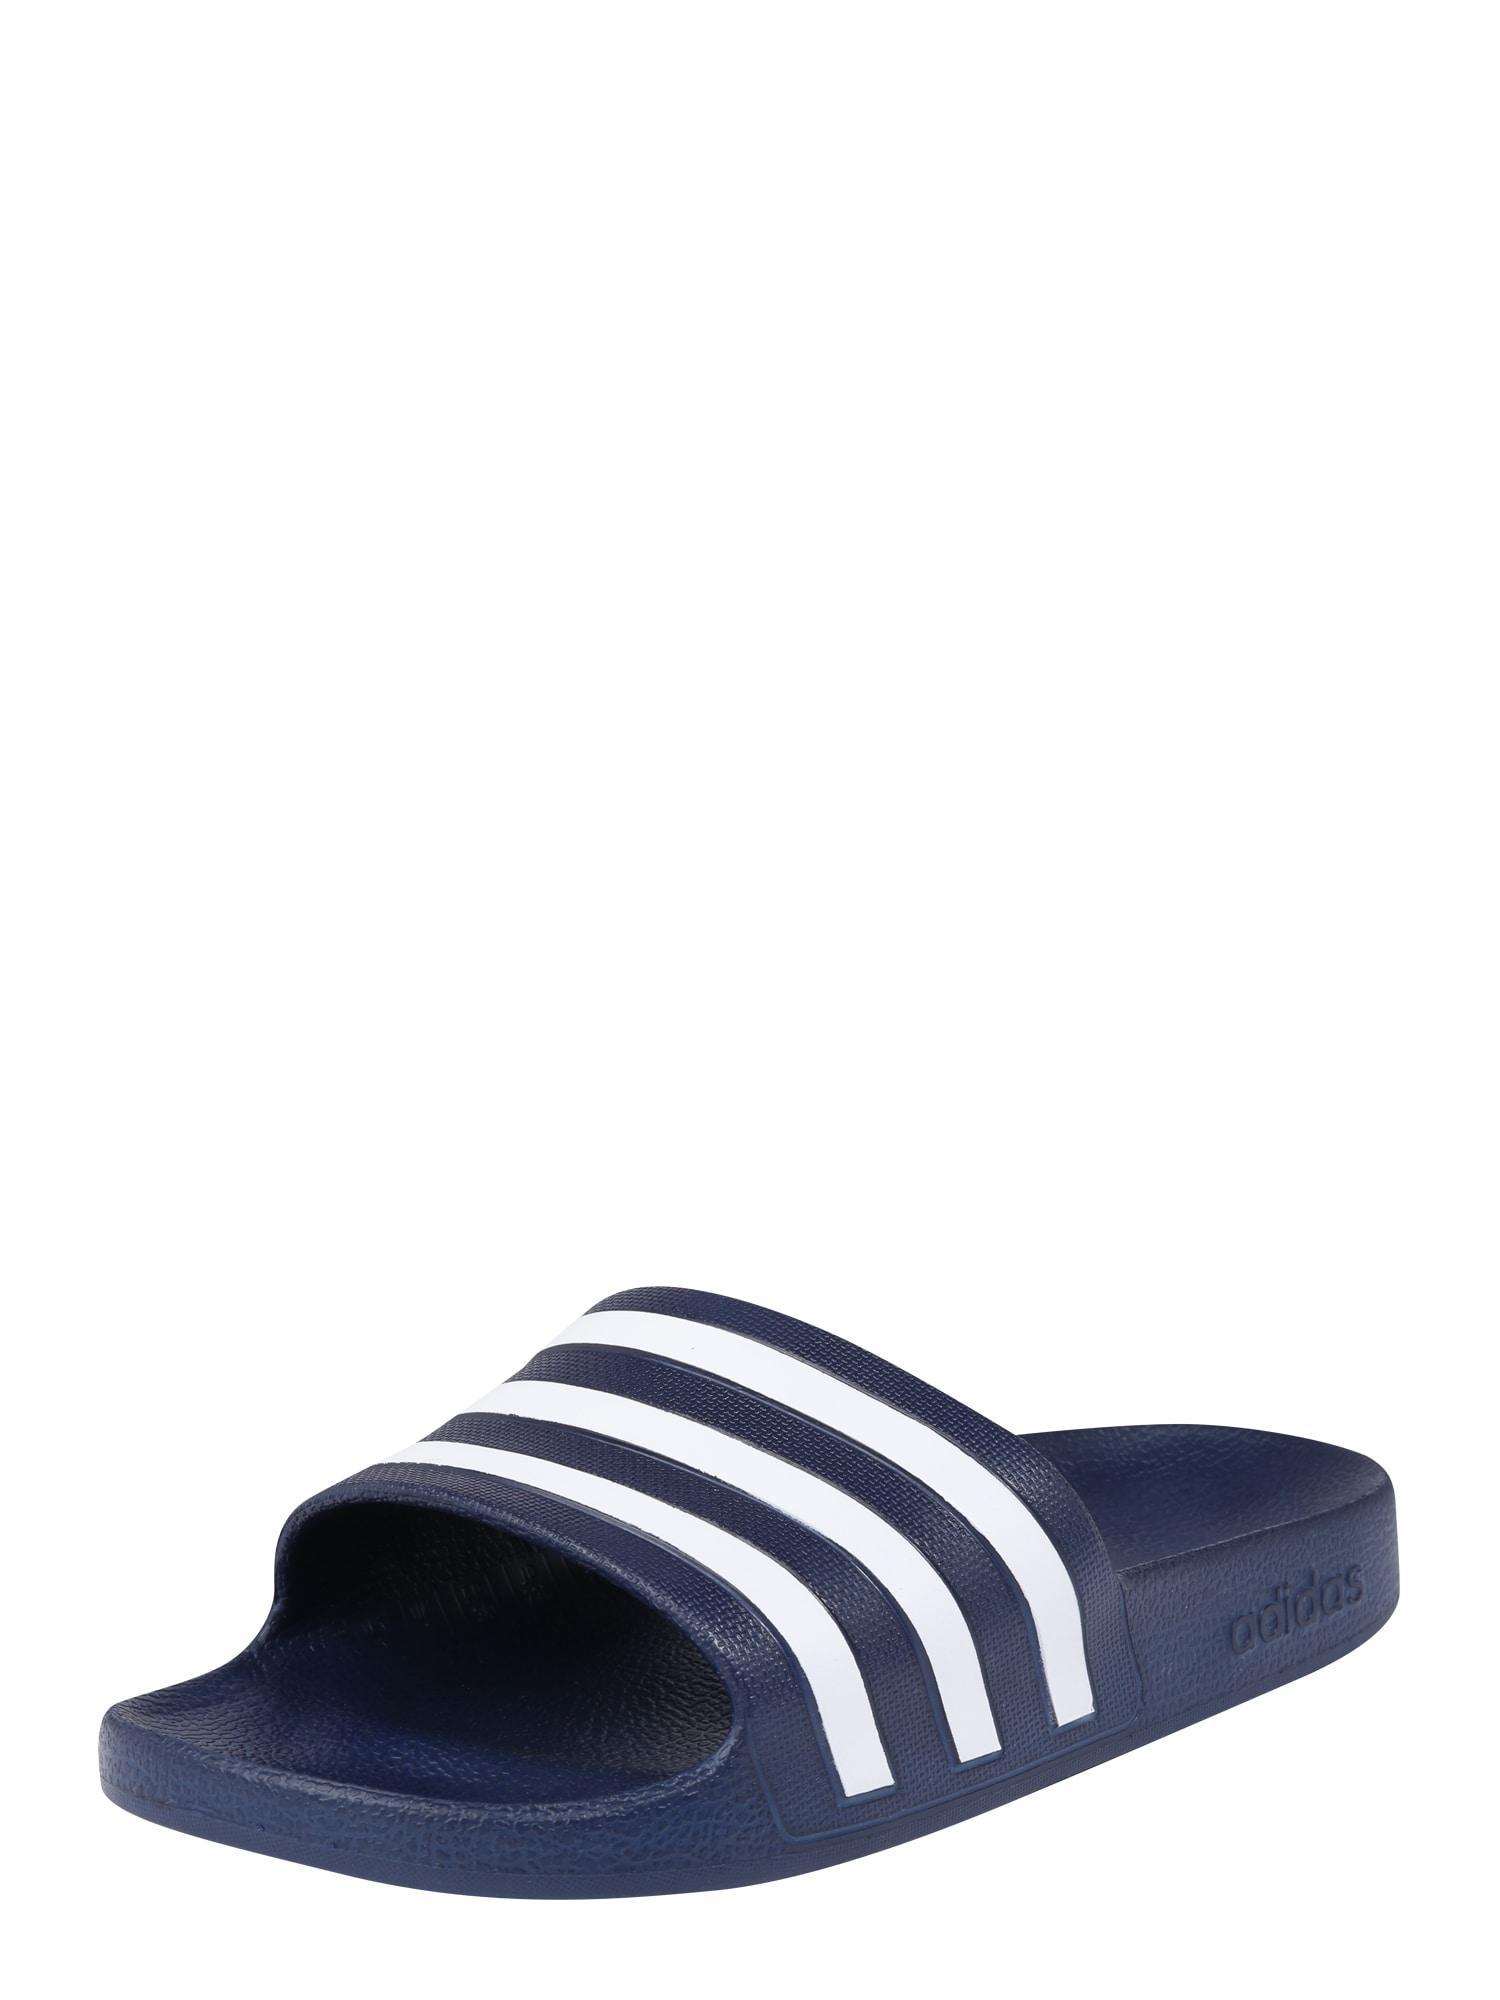 Pantofle Adilette Aqua tmavě modrá bílá ADIDAS ORIGINALS